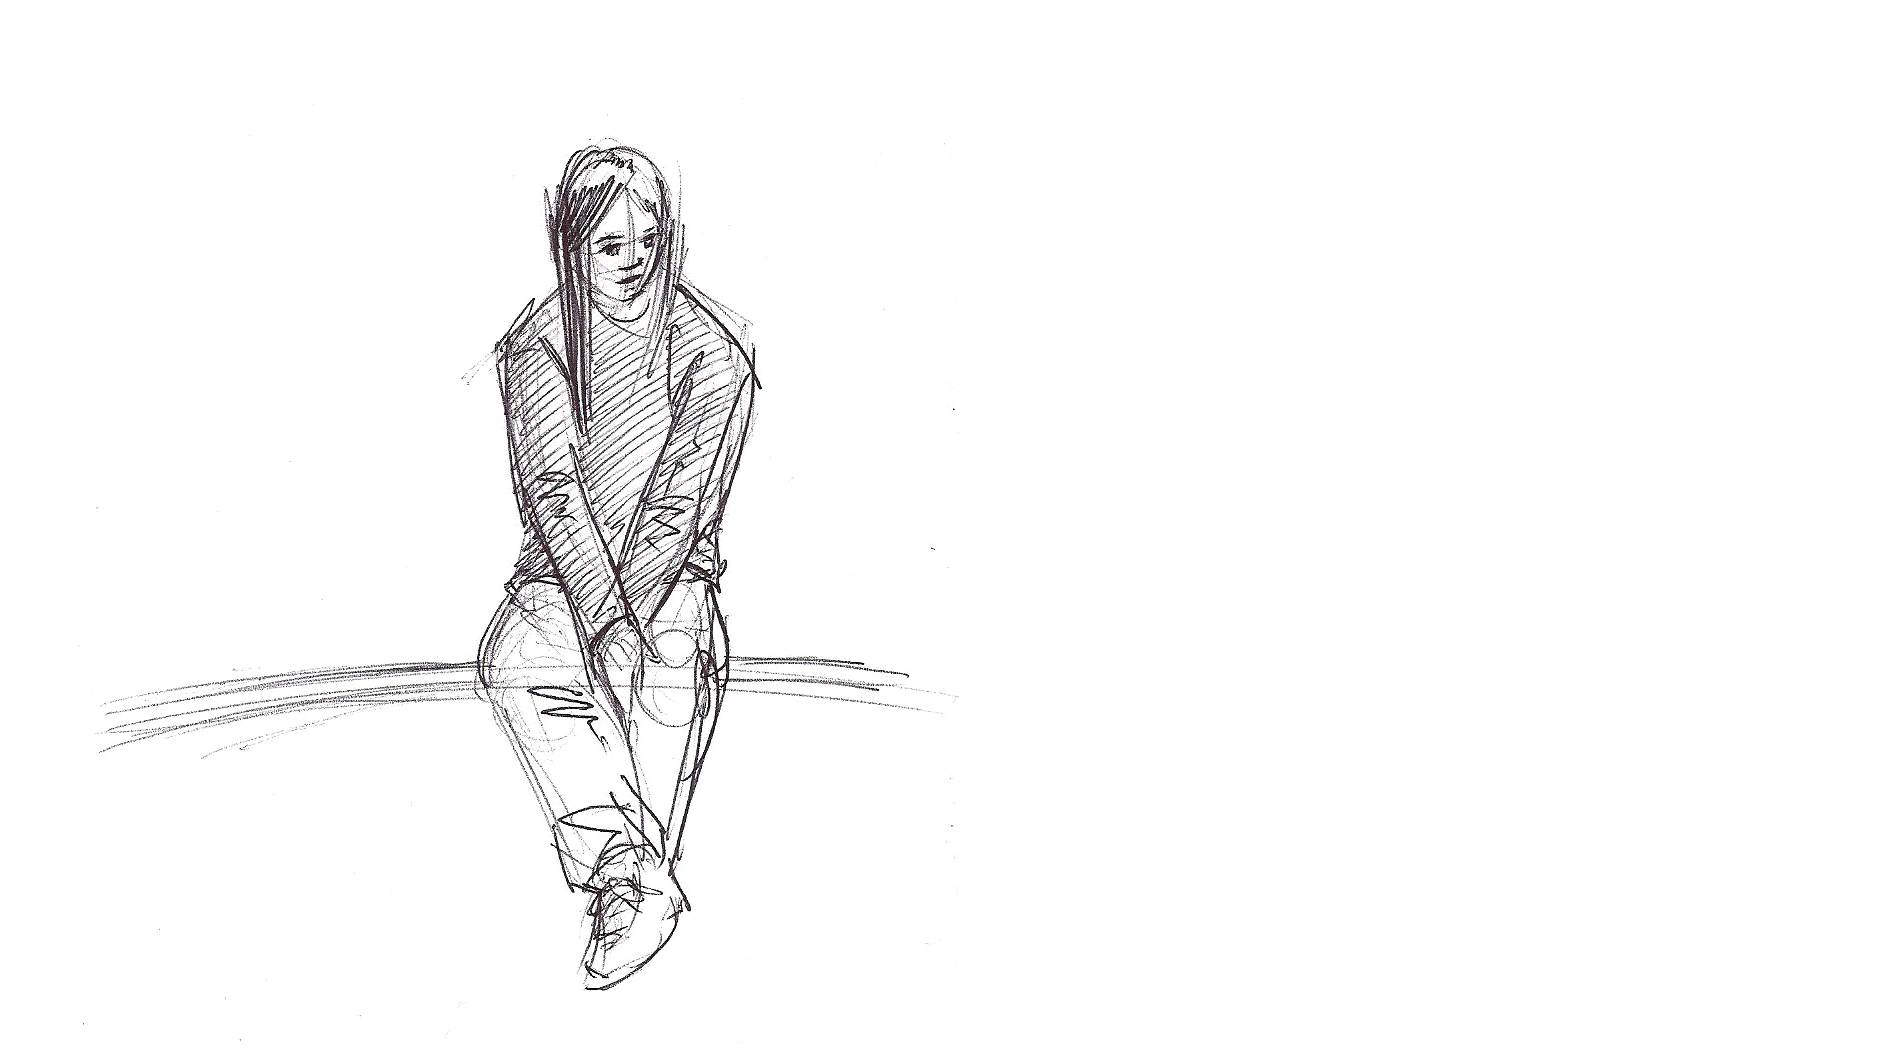 Fa Yuen sketches (2) - 1.jpg